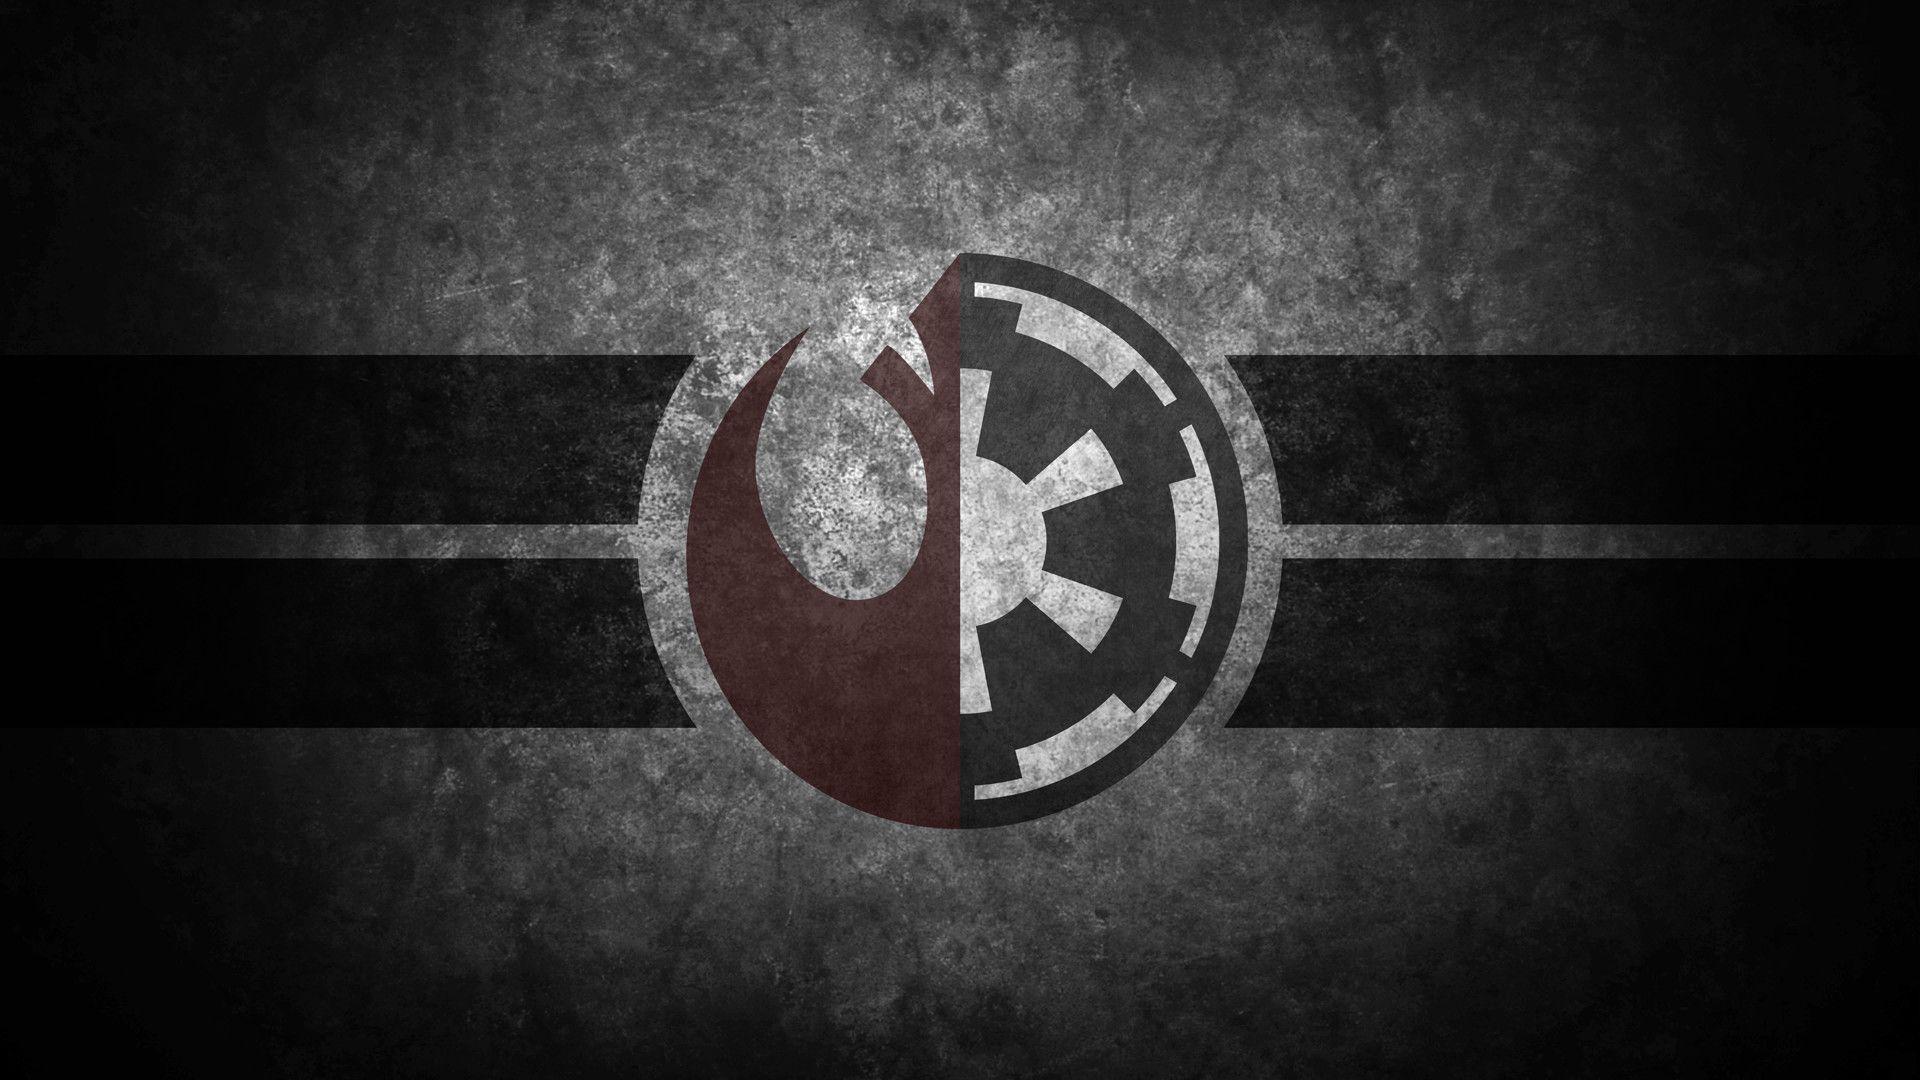 Star Wars Rebel Logo Desktop Wallpapers Wallpaper Cave